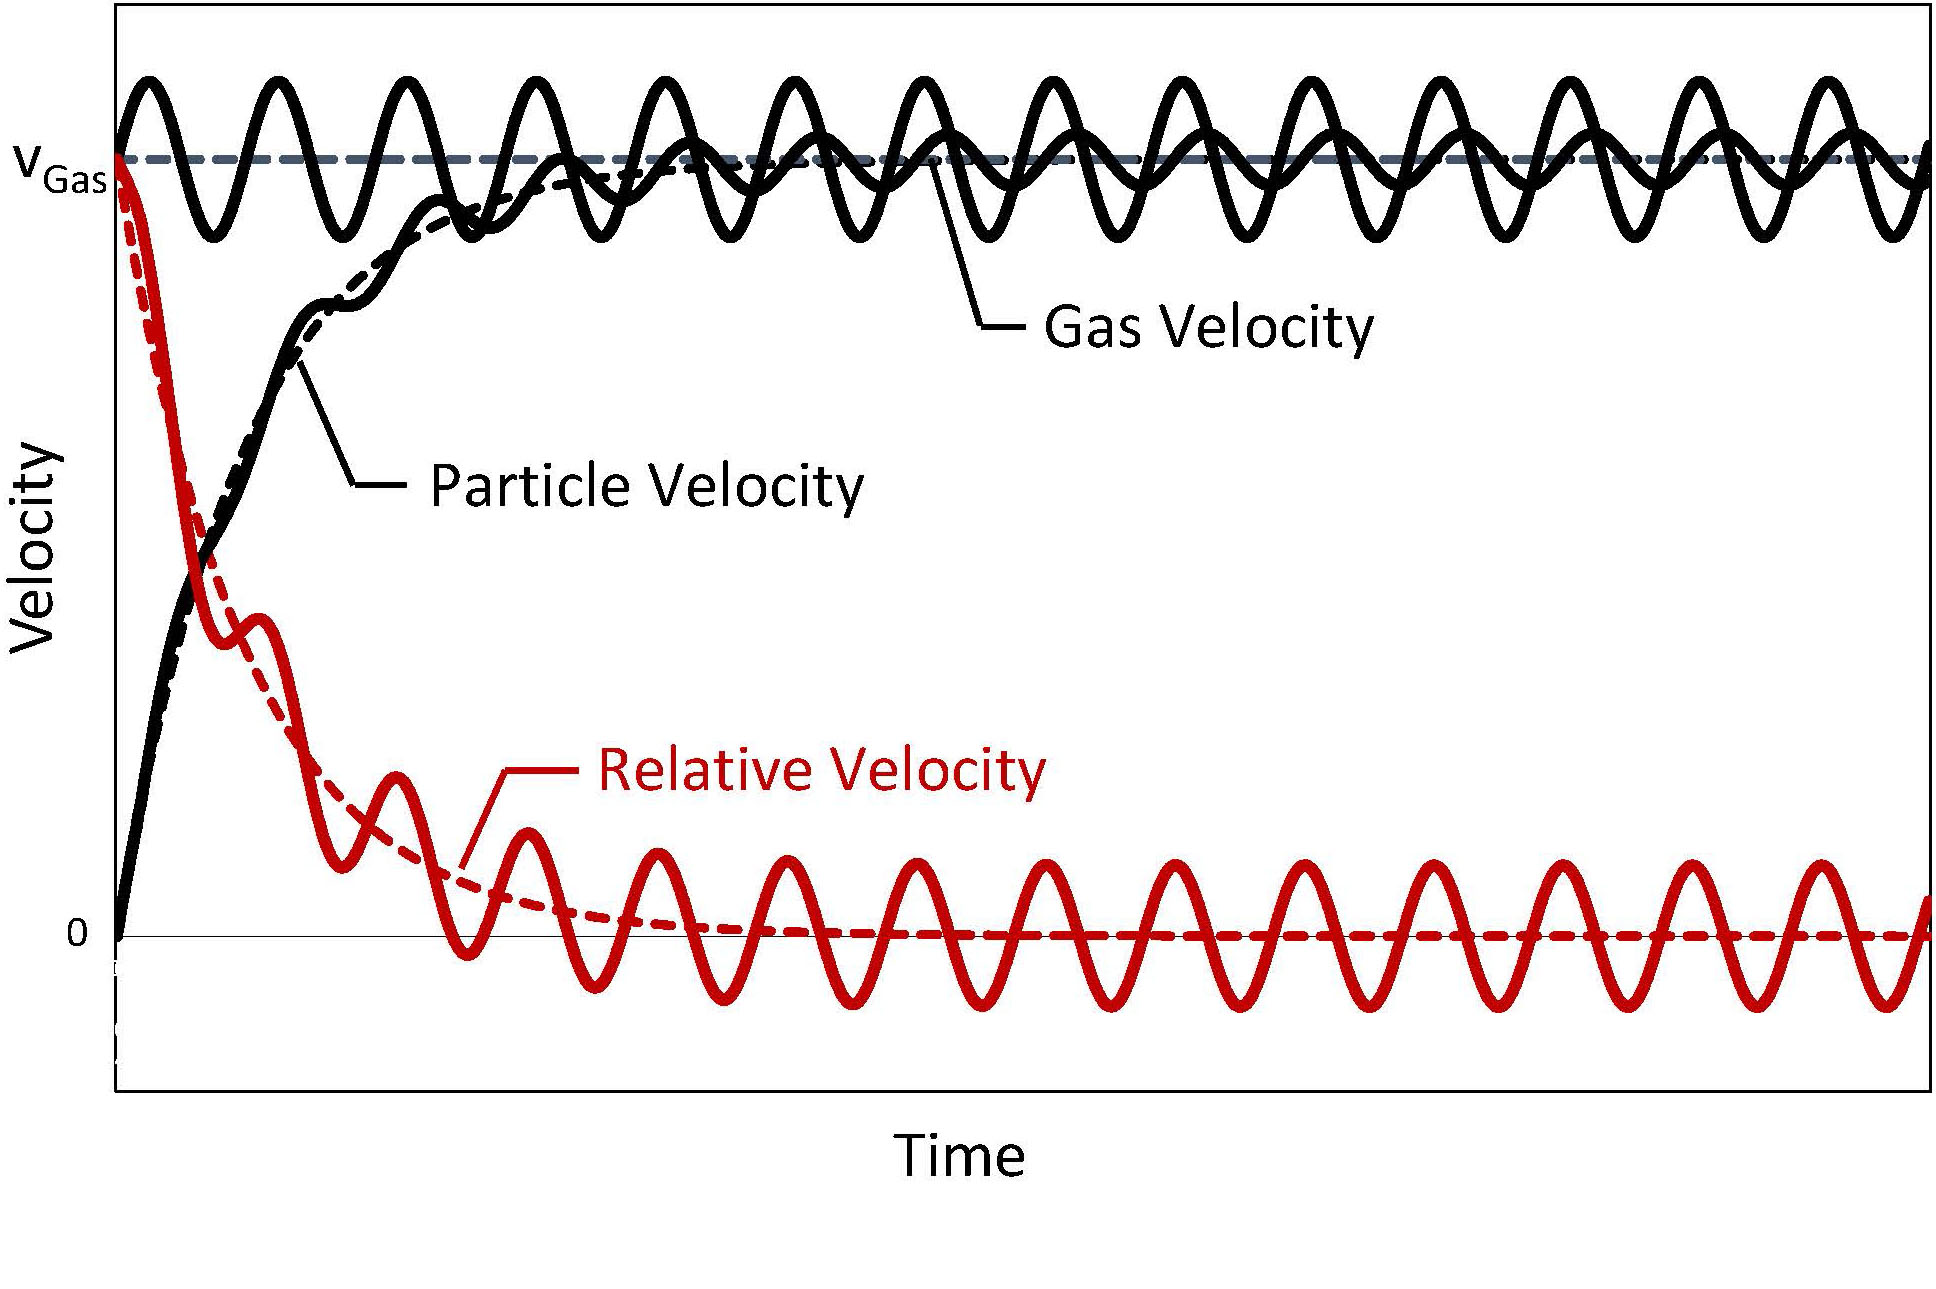 Glatt Powder Synthesis - Velocity characteristics within pulsed gas streams